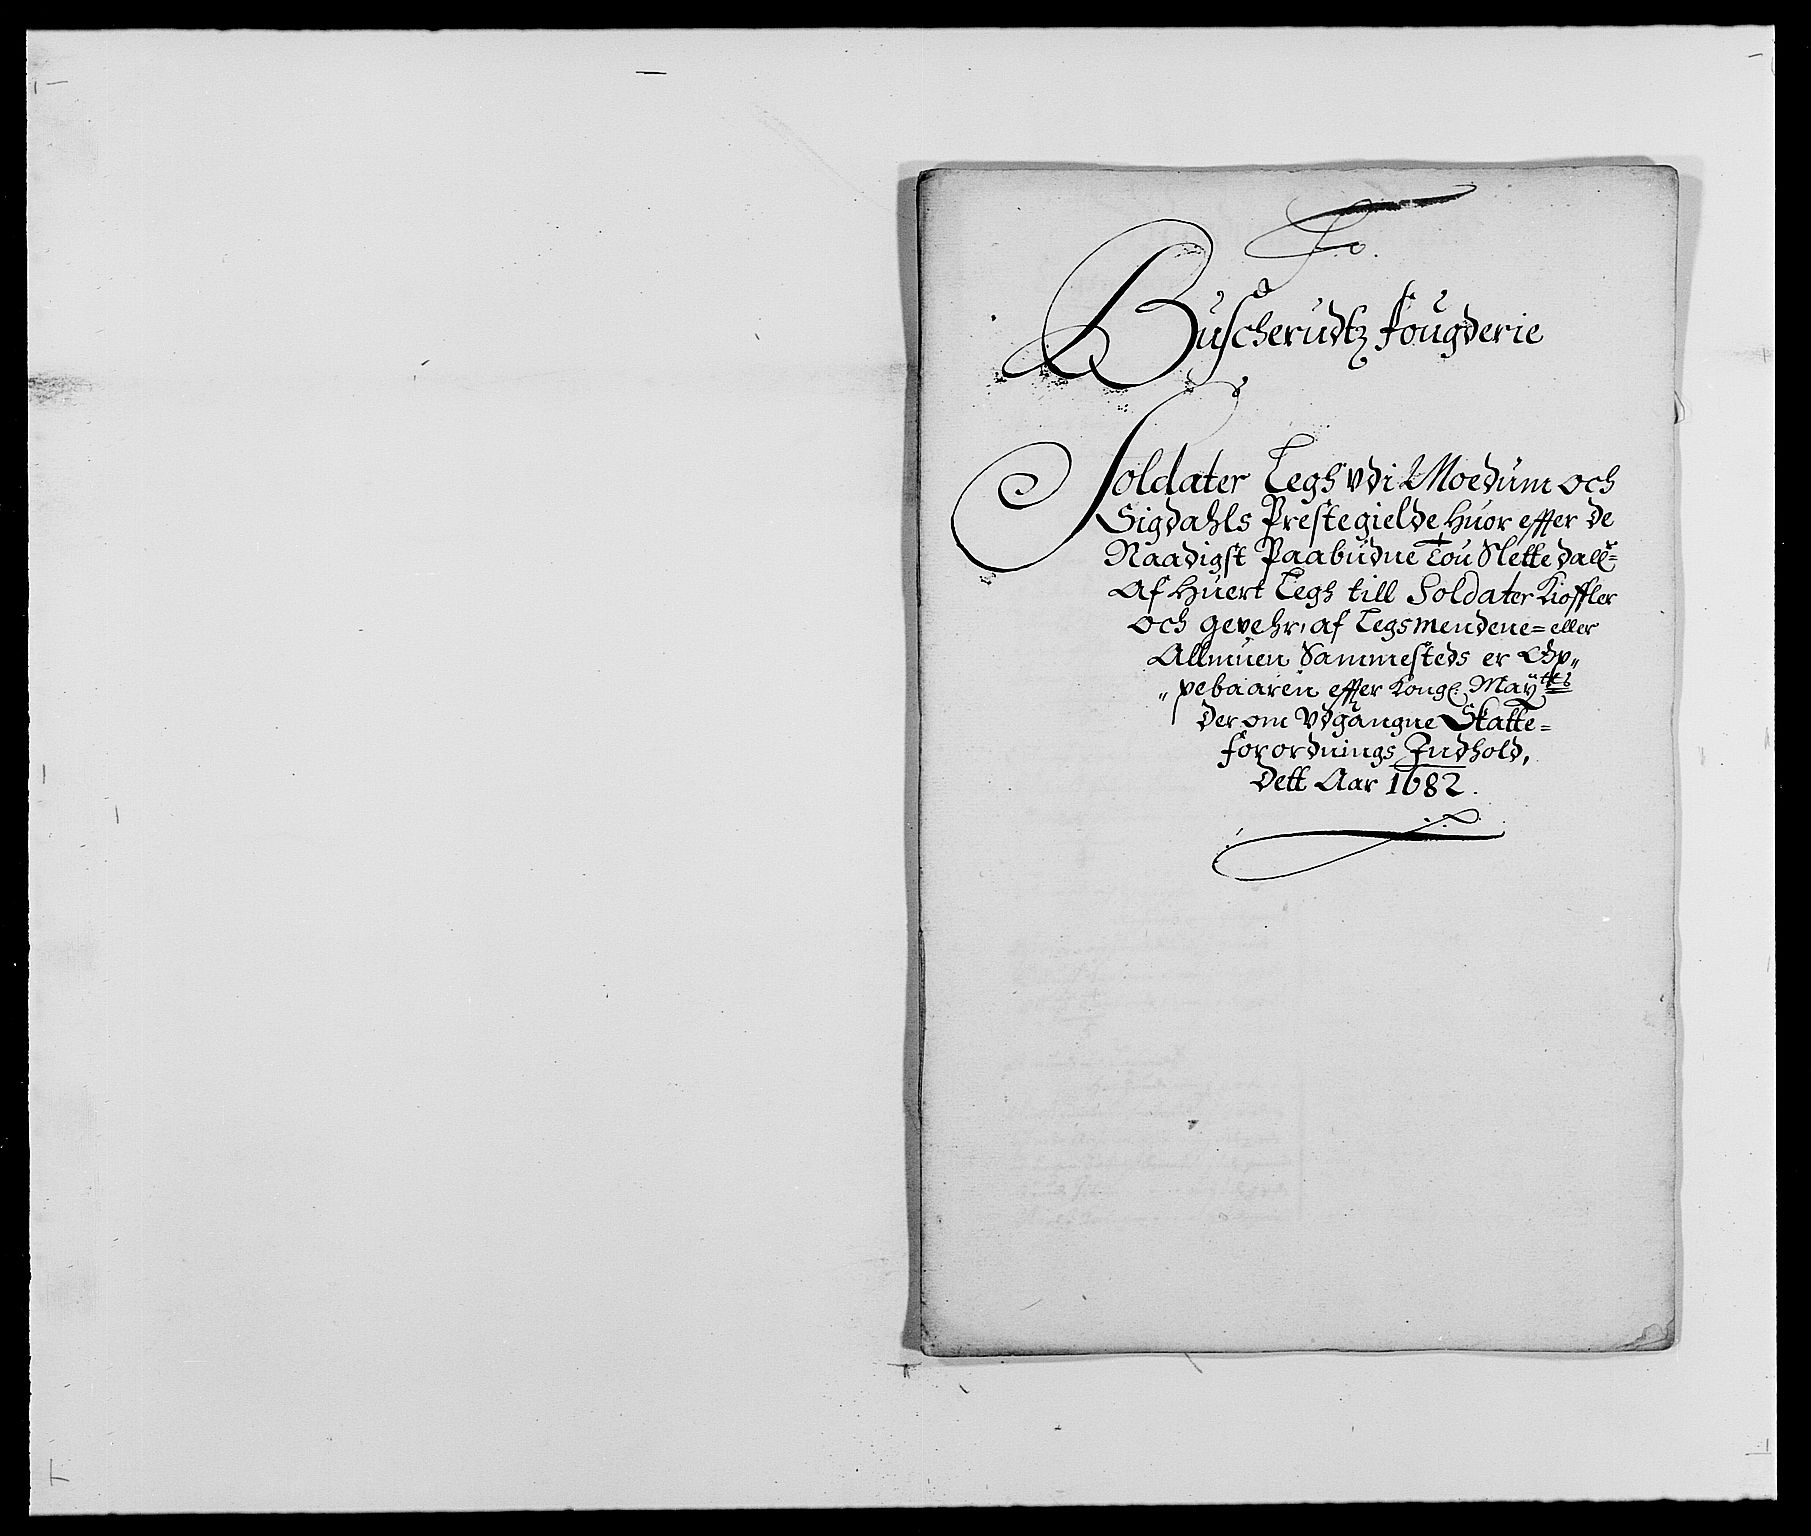 RA, Rentekammeret inntil 1814, Reviderte regnskaper, Fogderegnskap, R25/L1676: Fogderegnskap Buskerud, 1682, s. 102